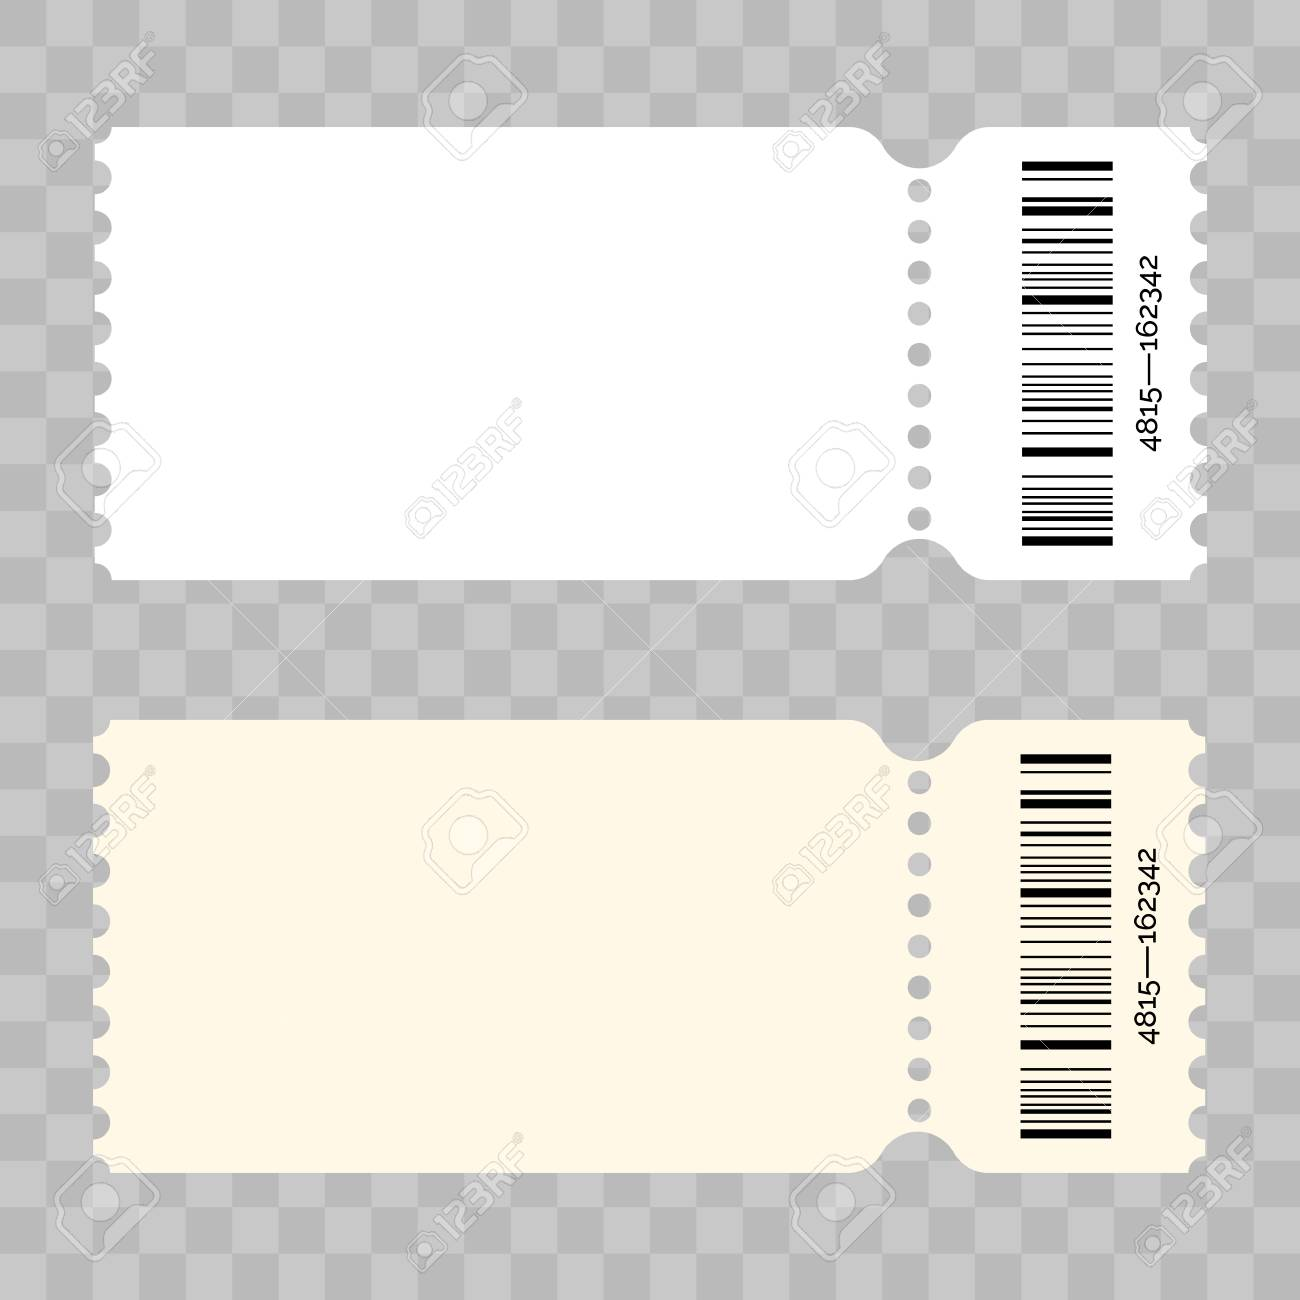 Ticket Template   Ticket Template Modern Trendy Blank Design Vector Admit Ticket With